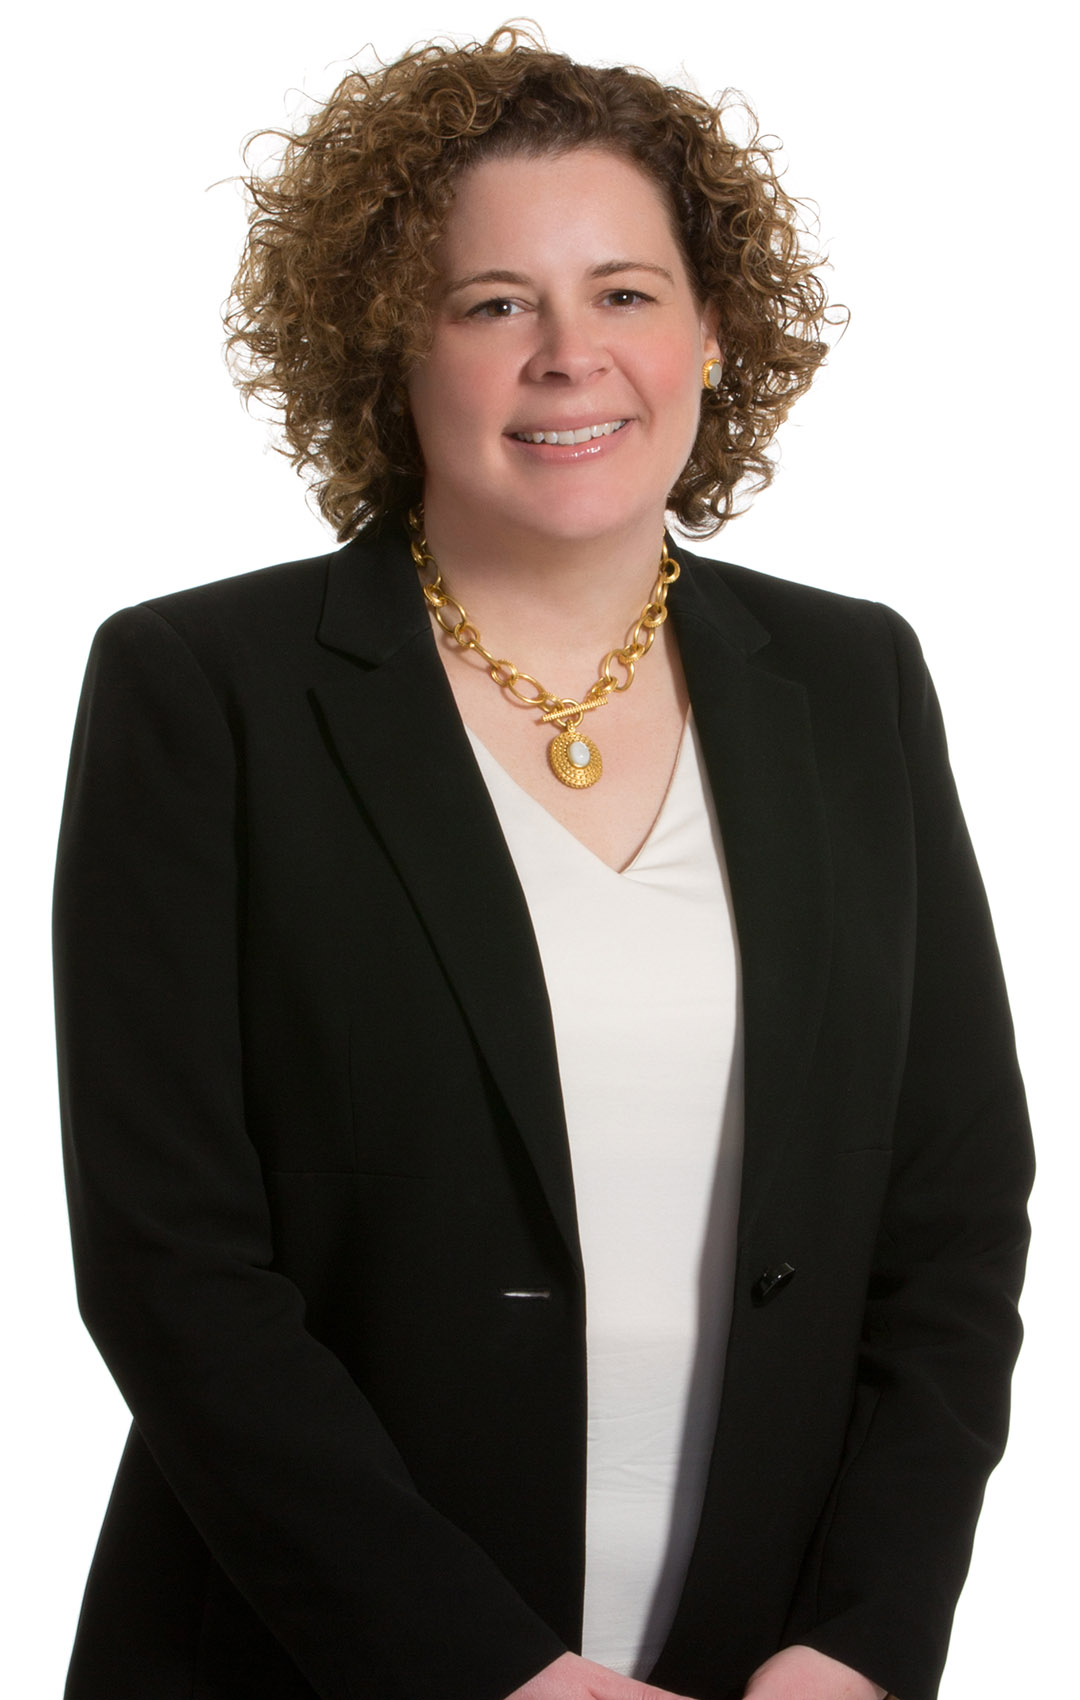 Elizabeth C. Trahos